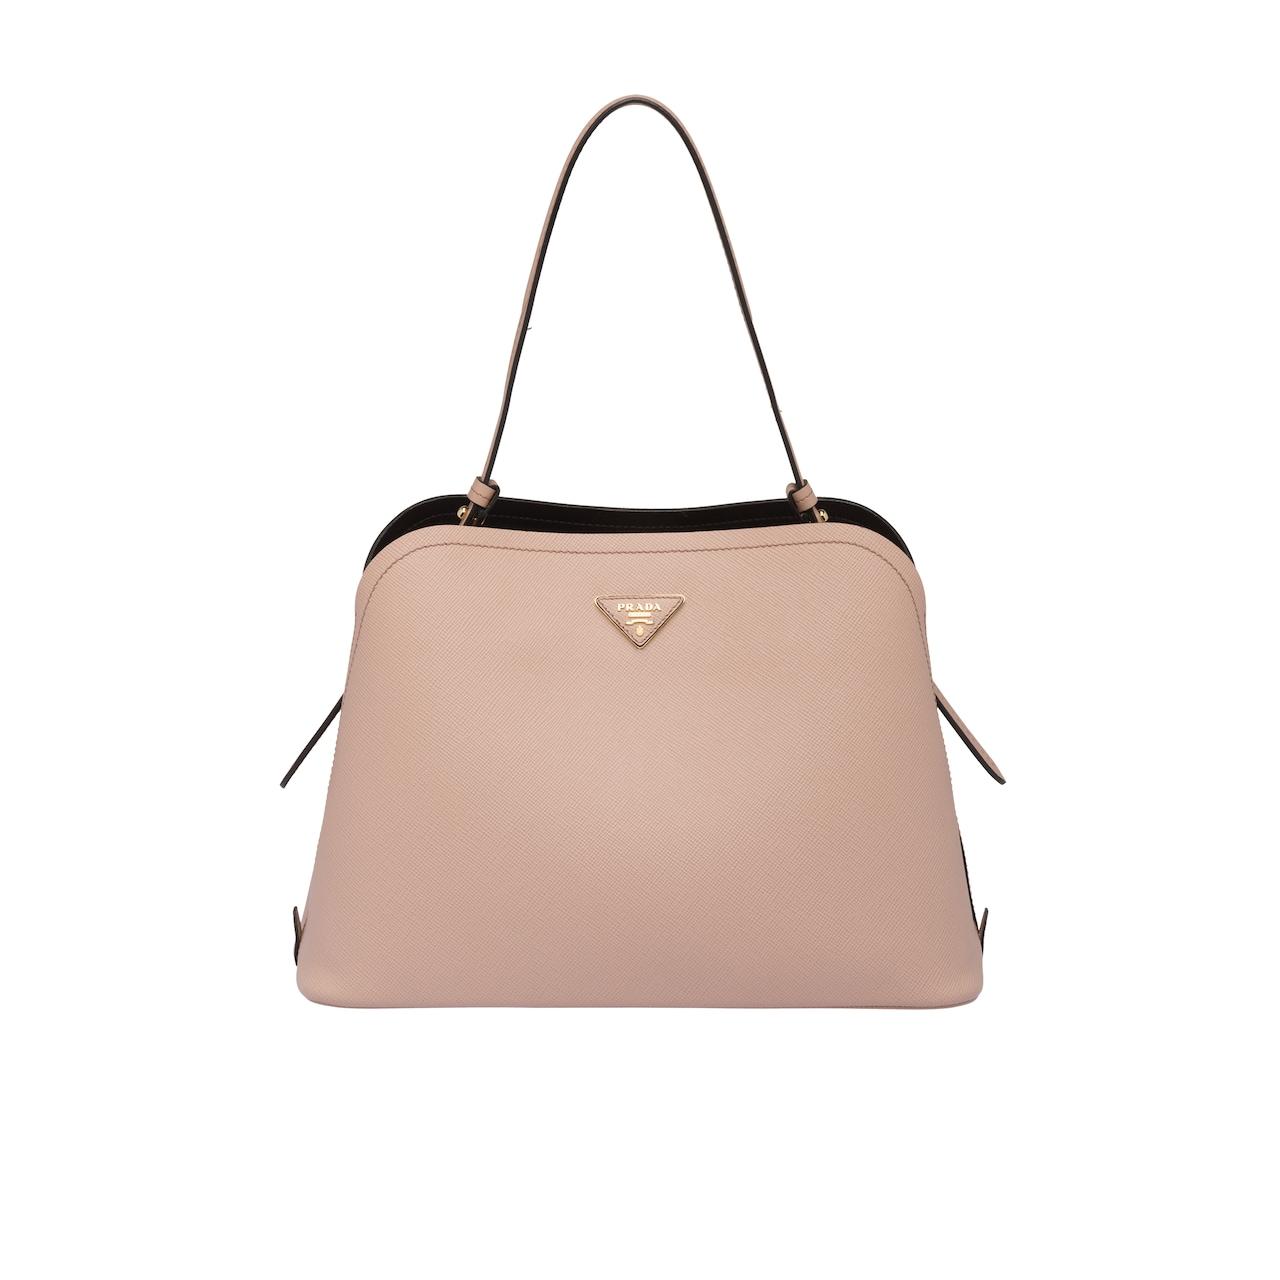 Prada Matinee handbag